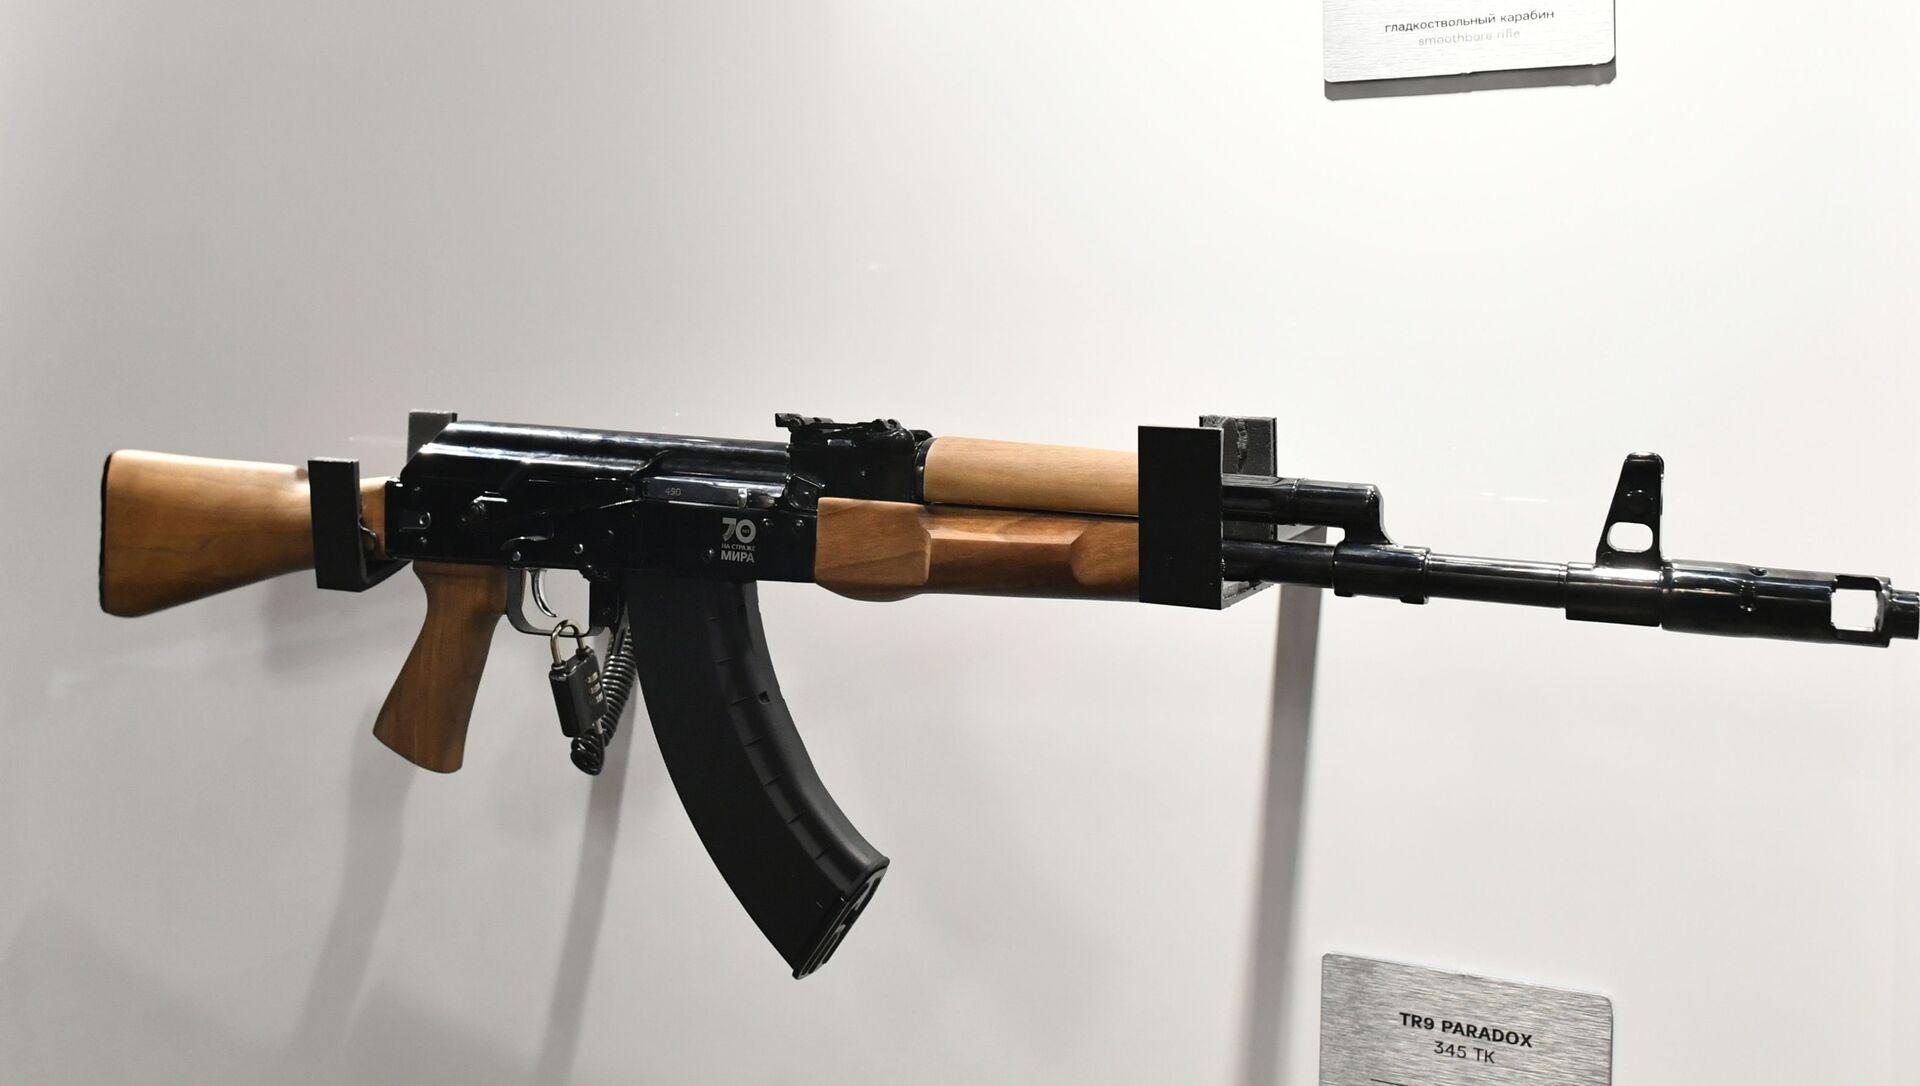 Una carabina civil TG2 de Kalashnikov. - Sputnik Mundo, 1920, 09.02.2021